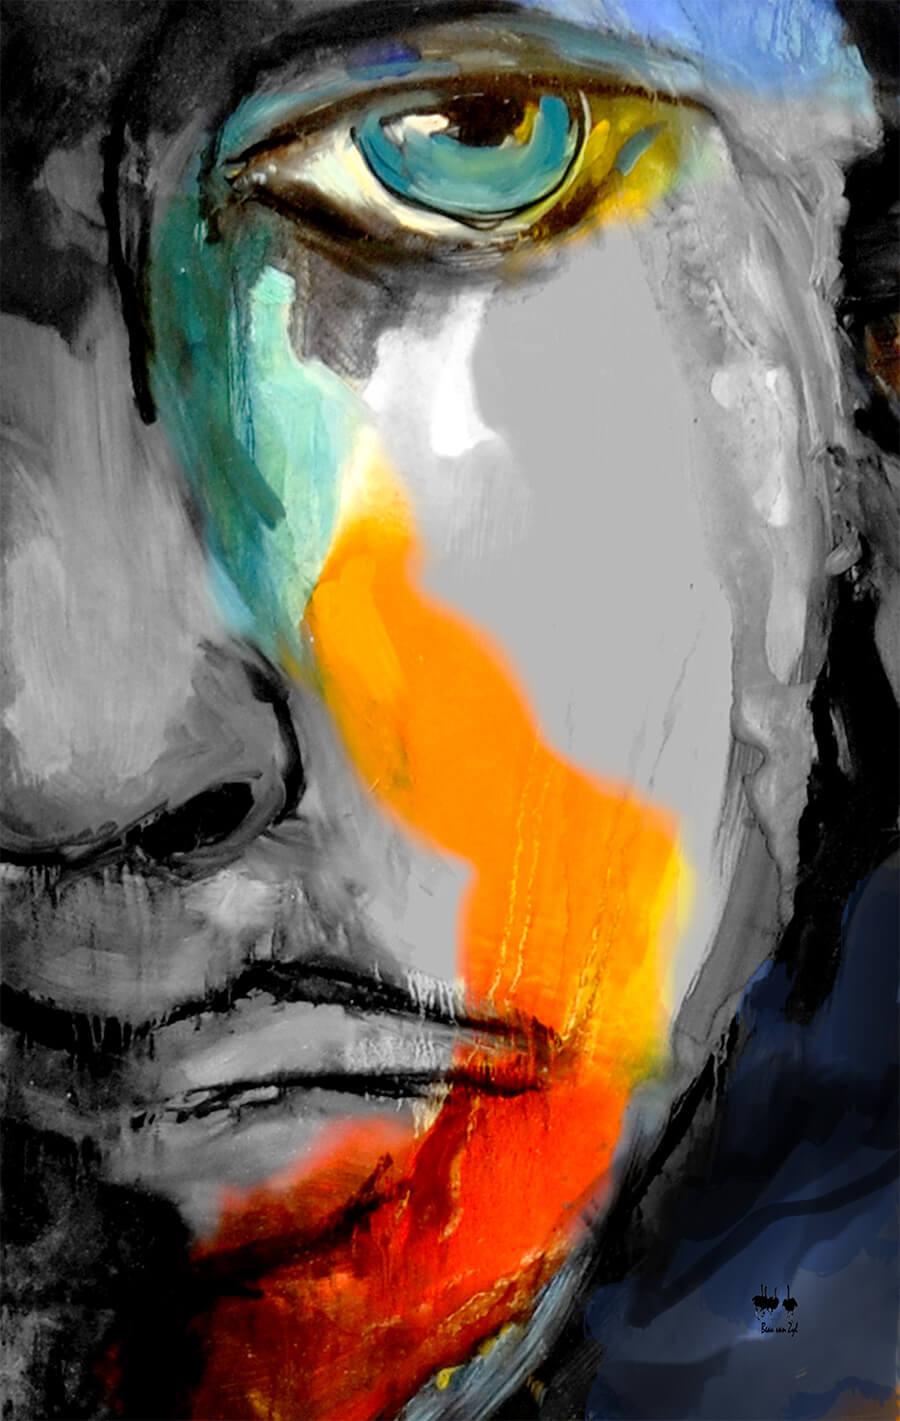 sad face painting